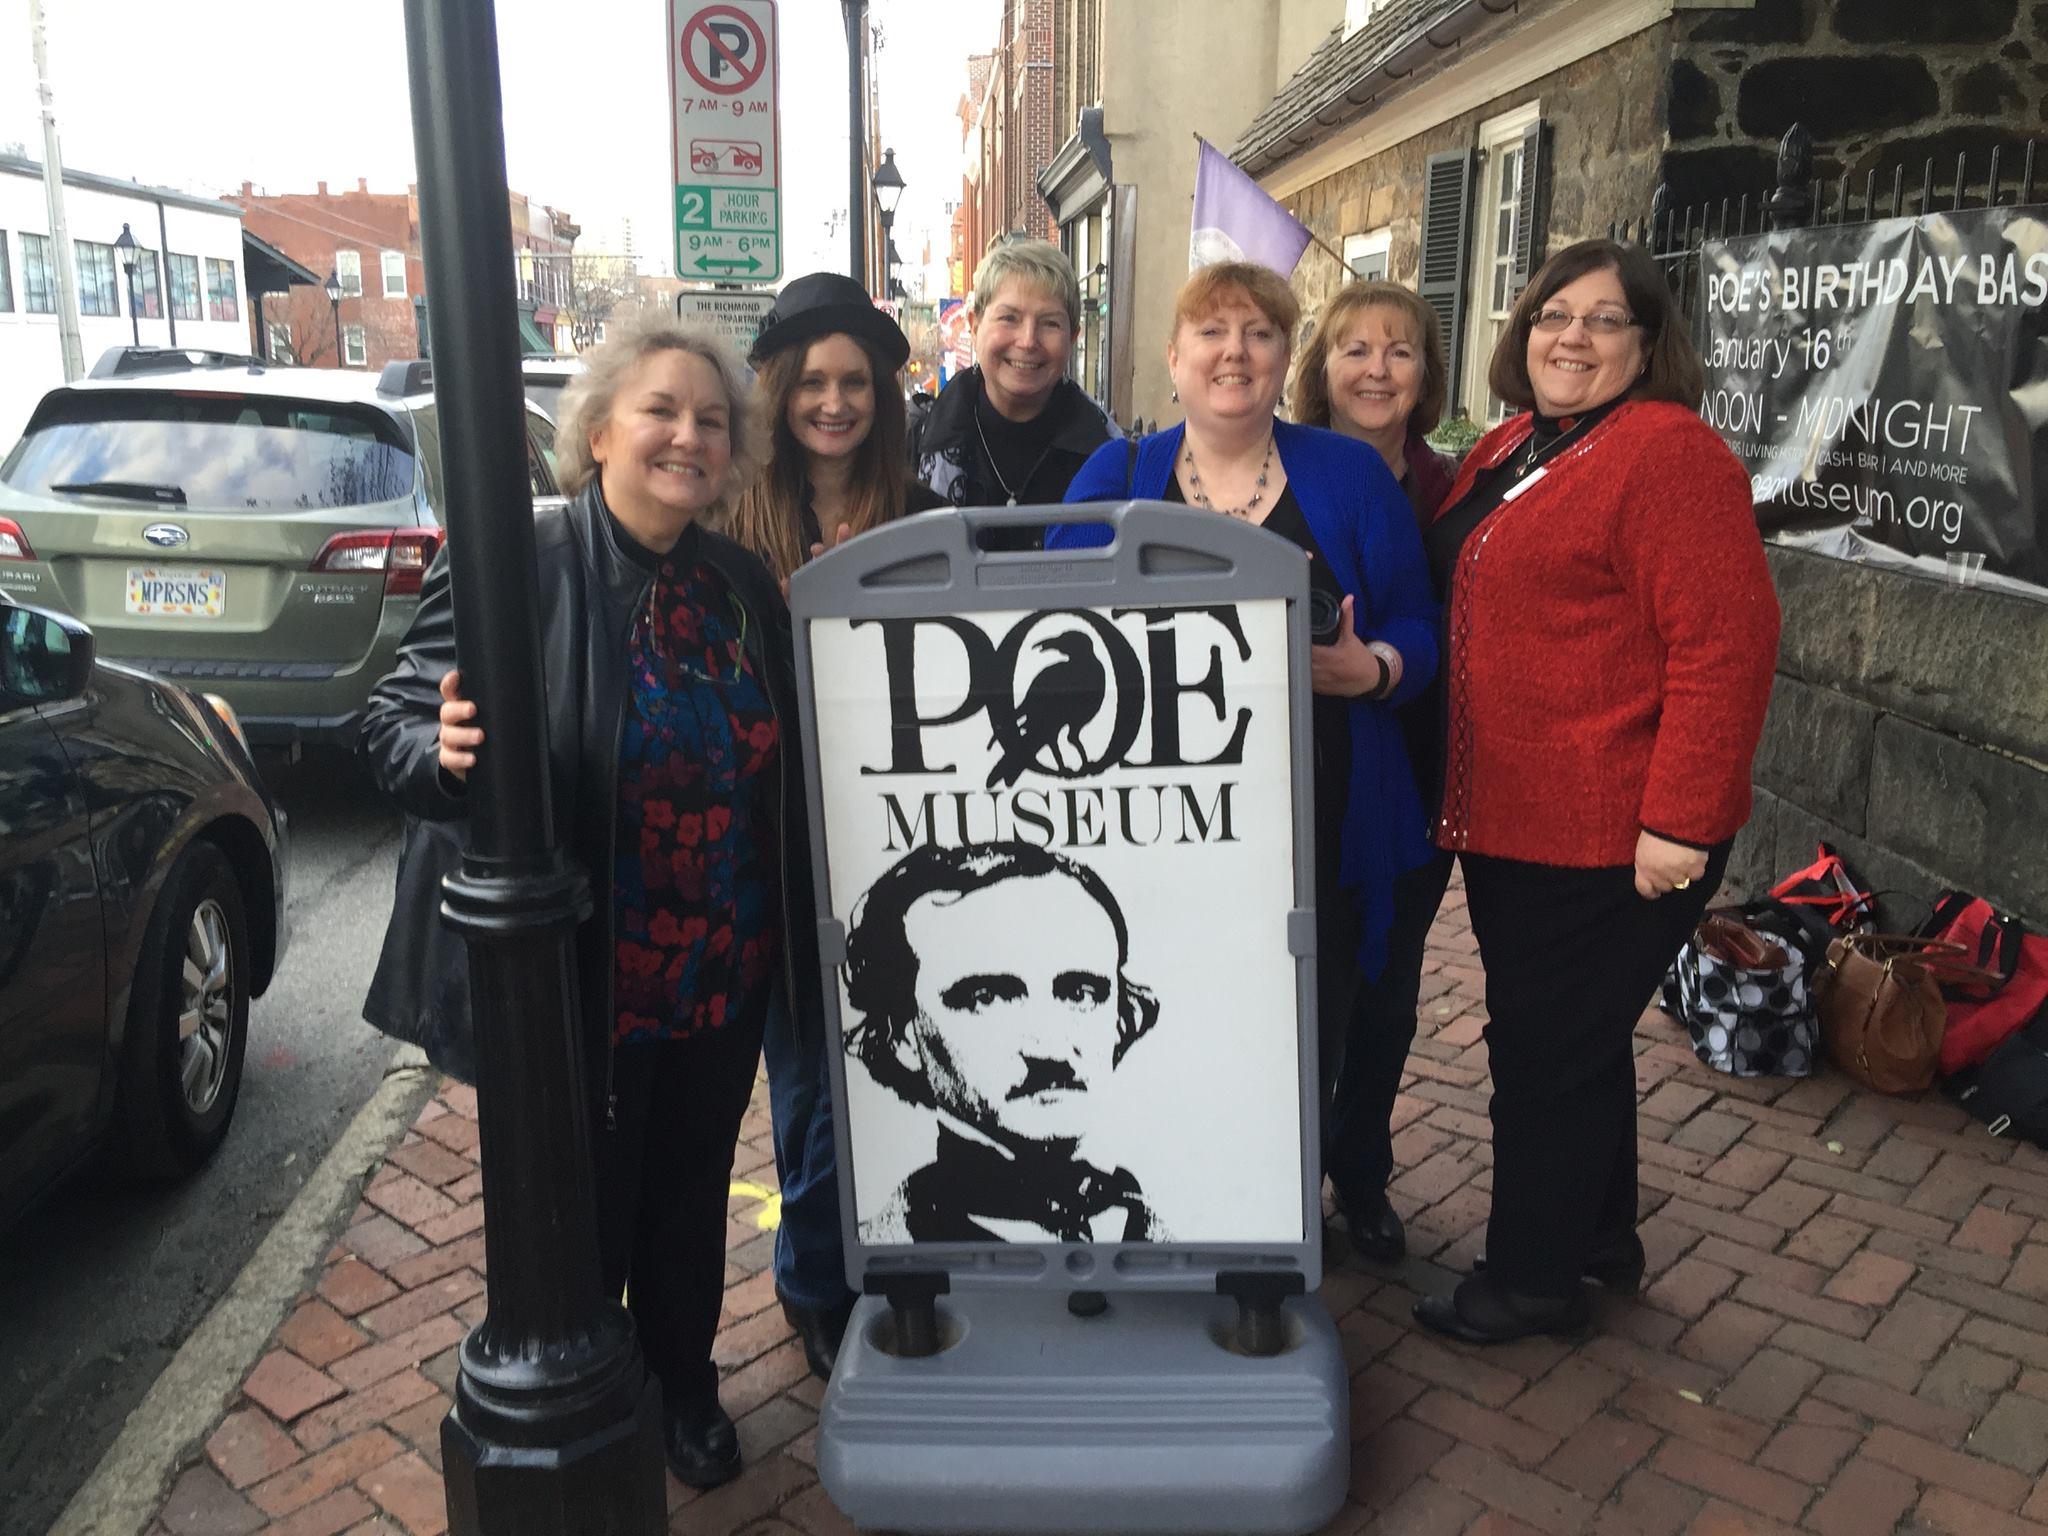 Rosie Shomaker, Teresa Inge, Vivian Lawry, Me, Maggie King, and Yvonne Saxon at the Poe Museum in Richmond, VA